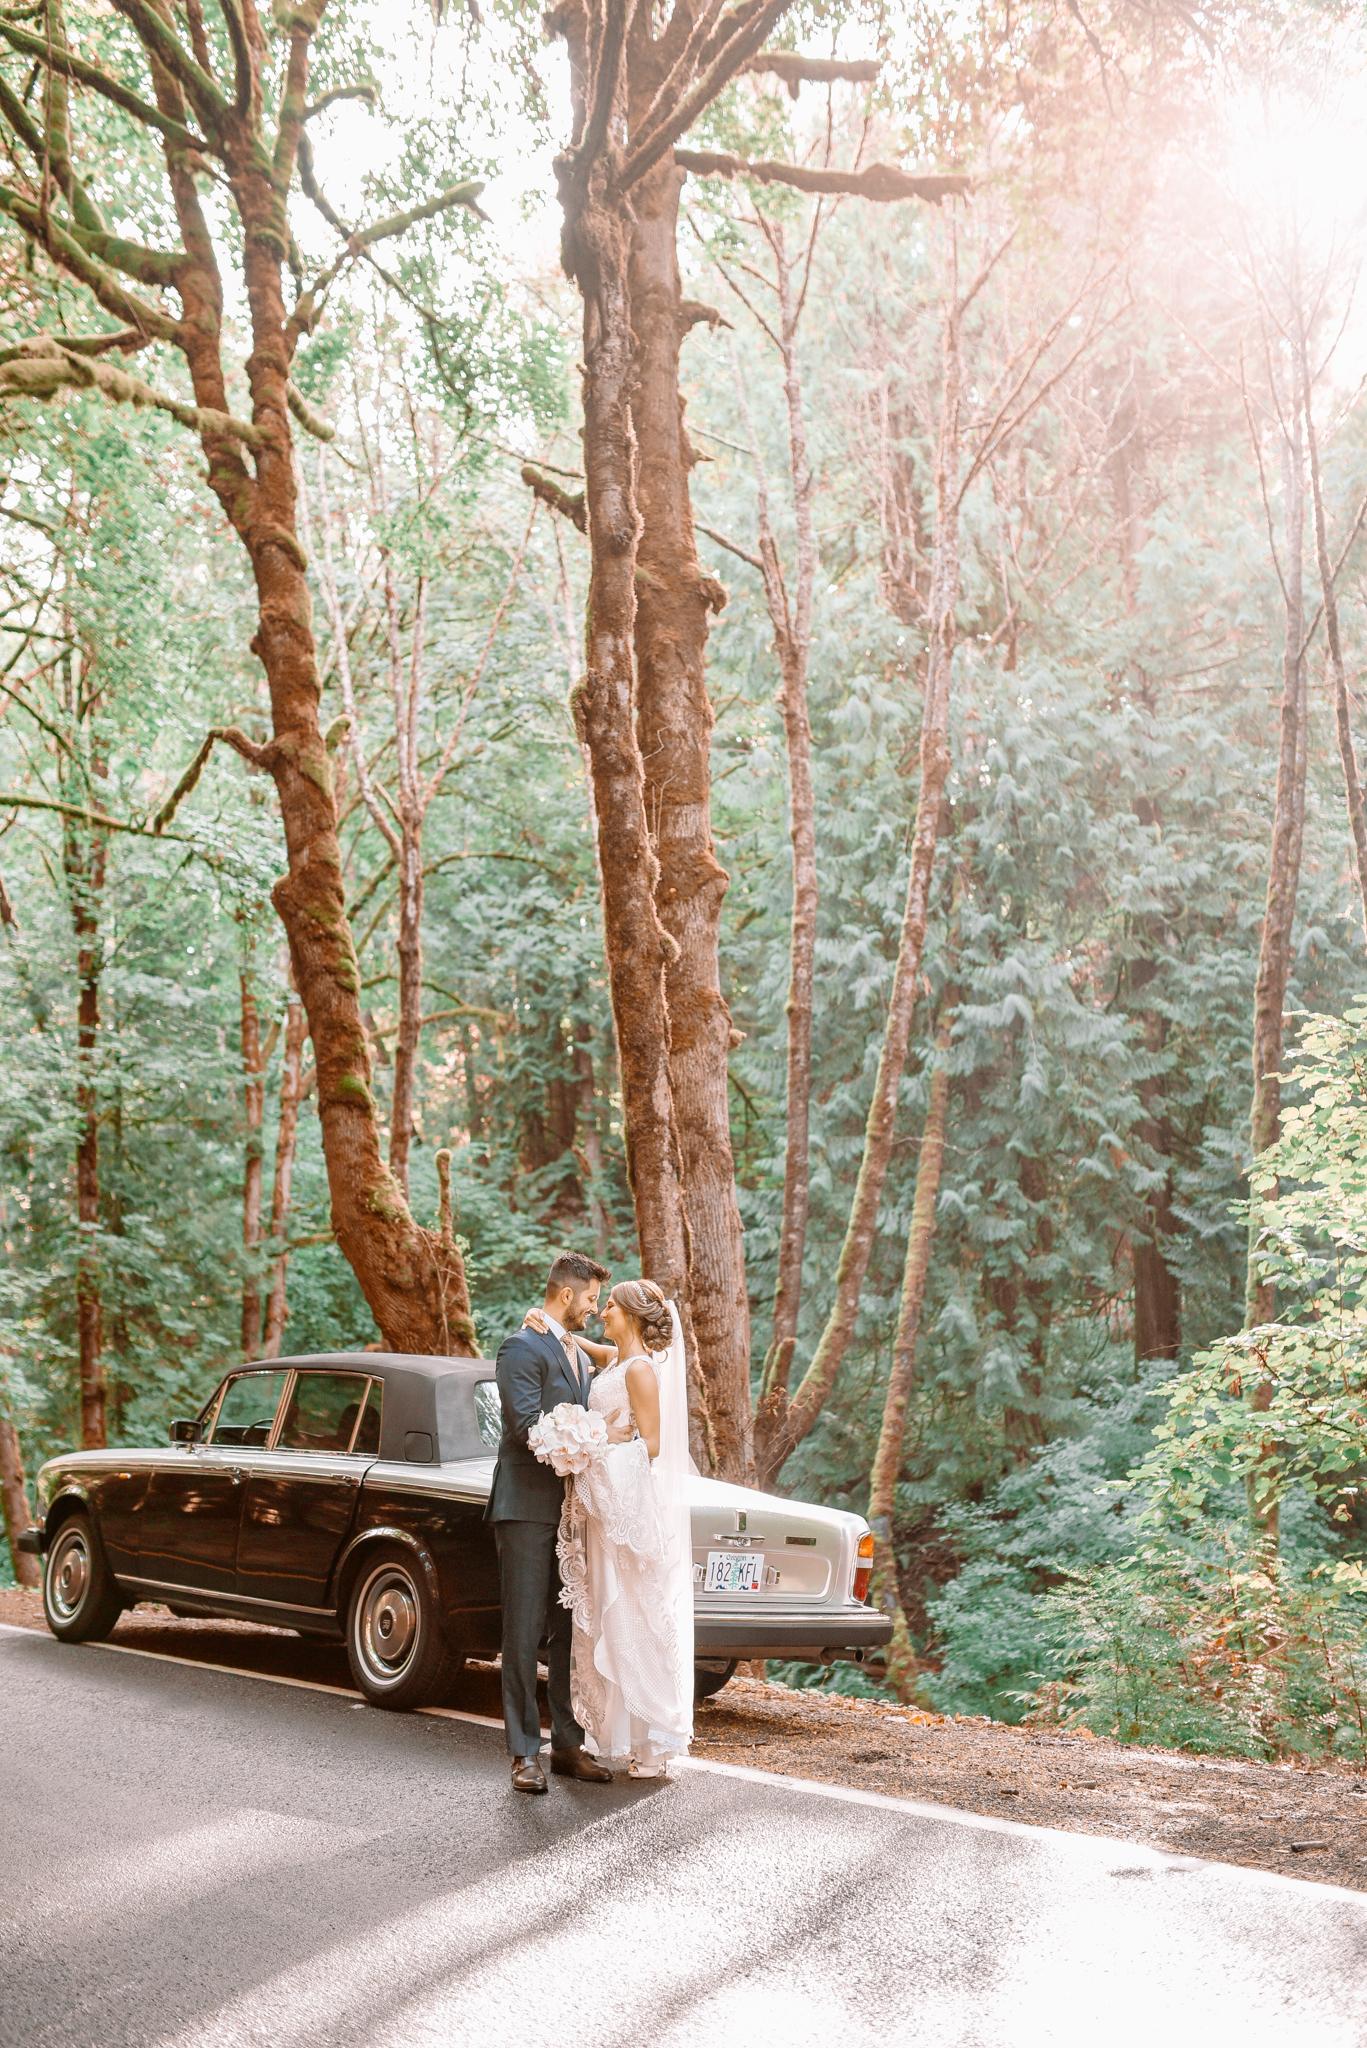 Judy and Theo - Portland Wedding Photographer - 17.jpg